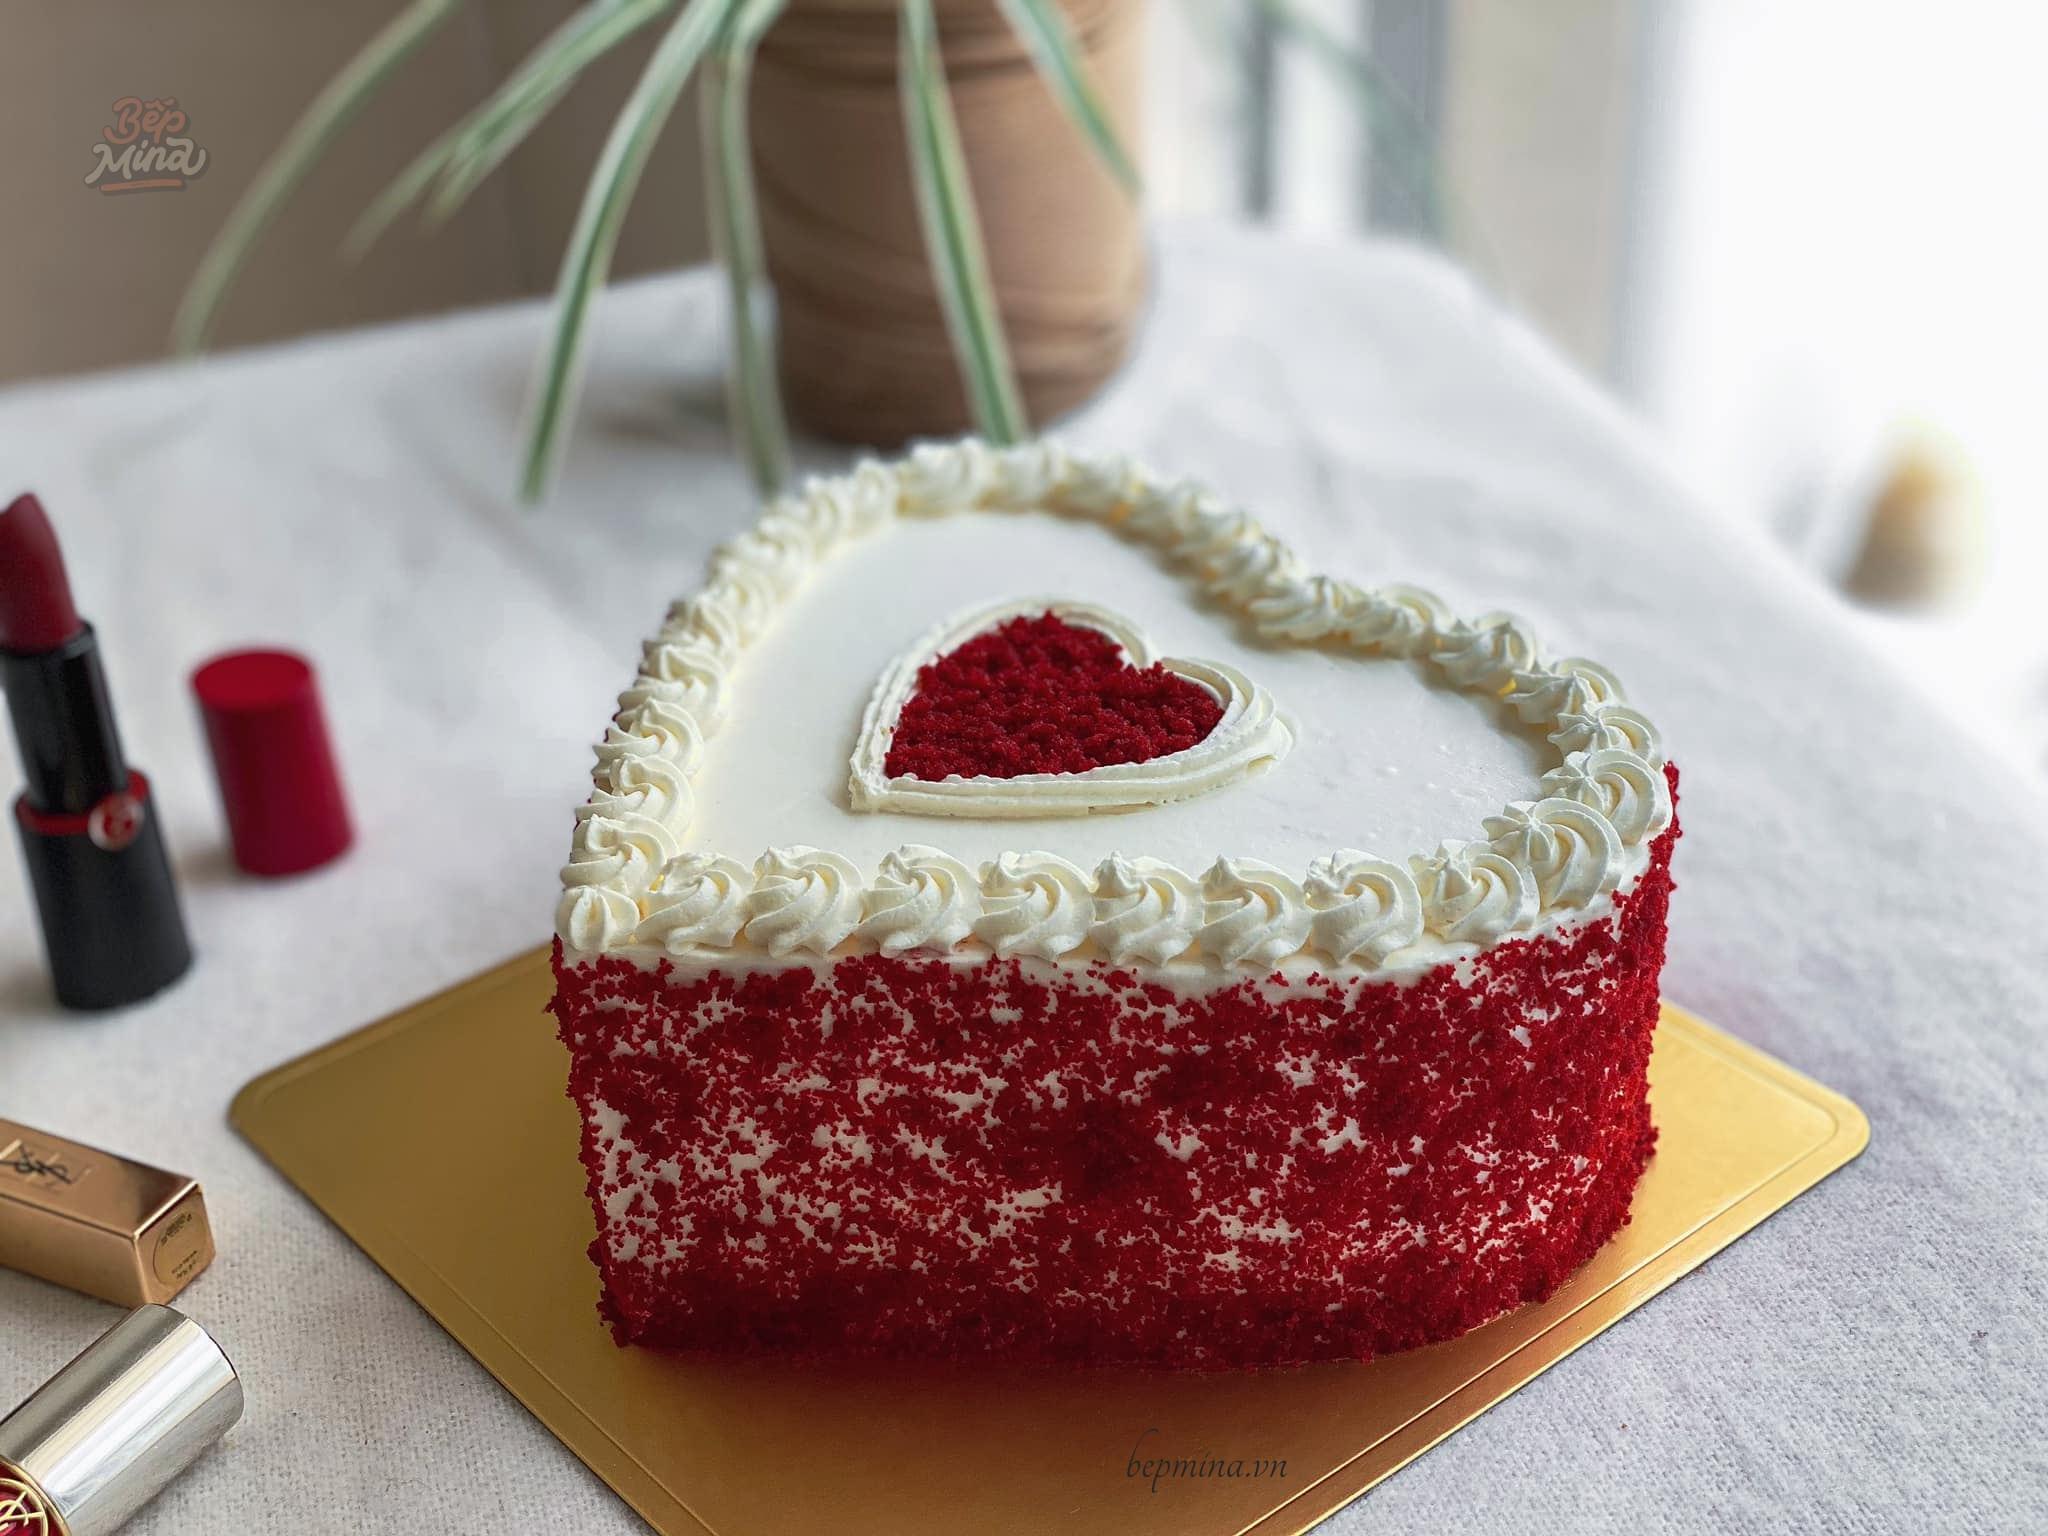 nguồn gốc bánh red Velvet